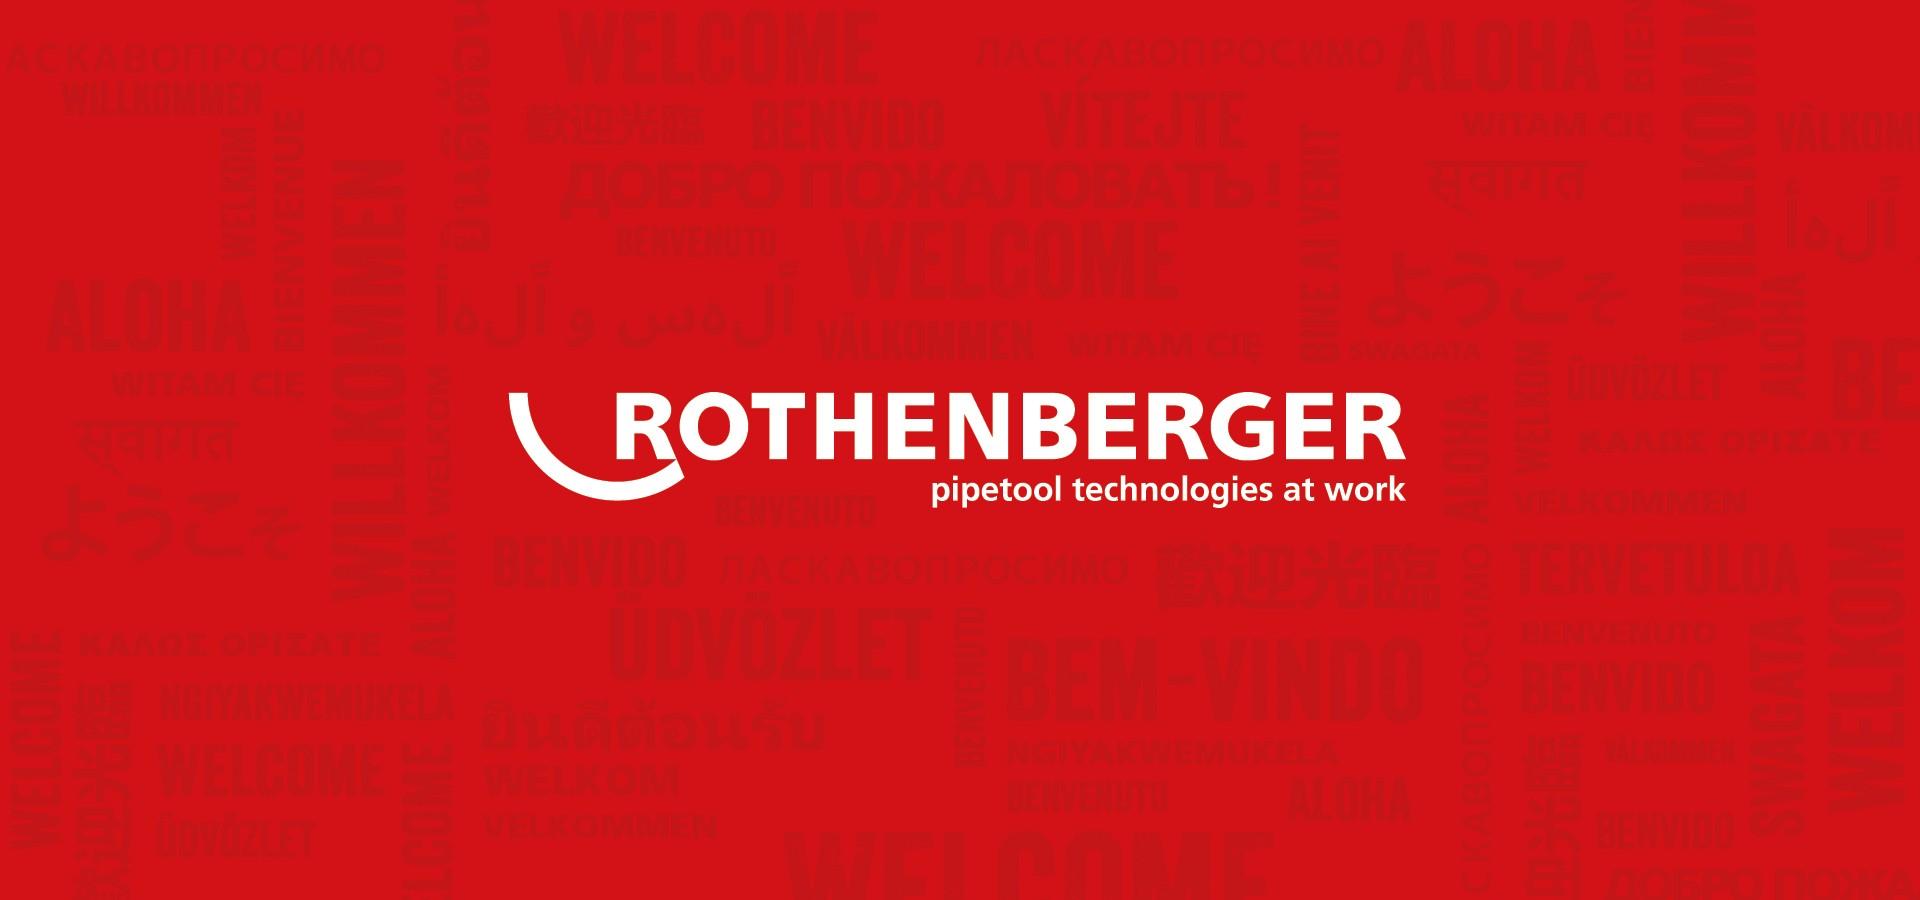 rothenberger brand